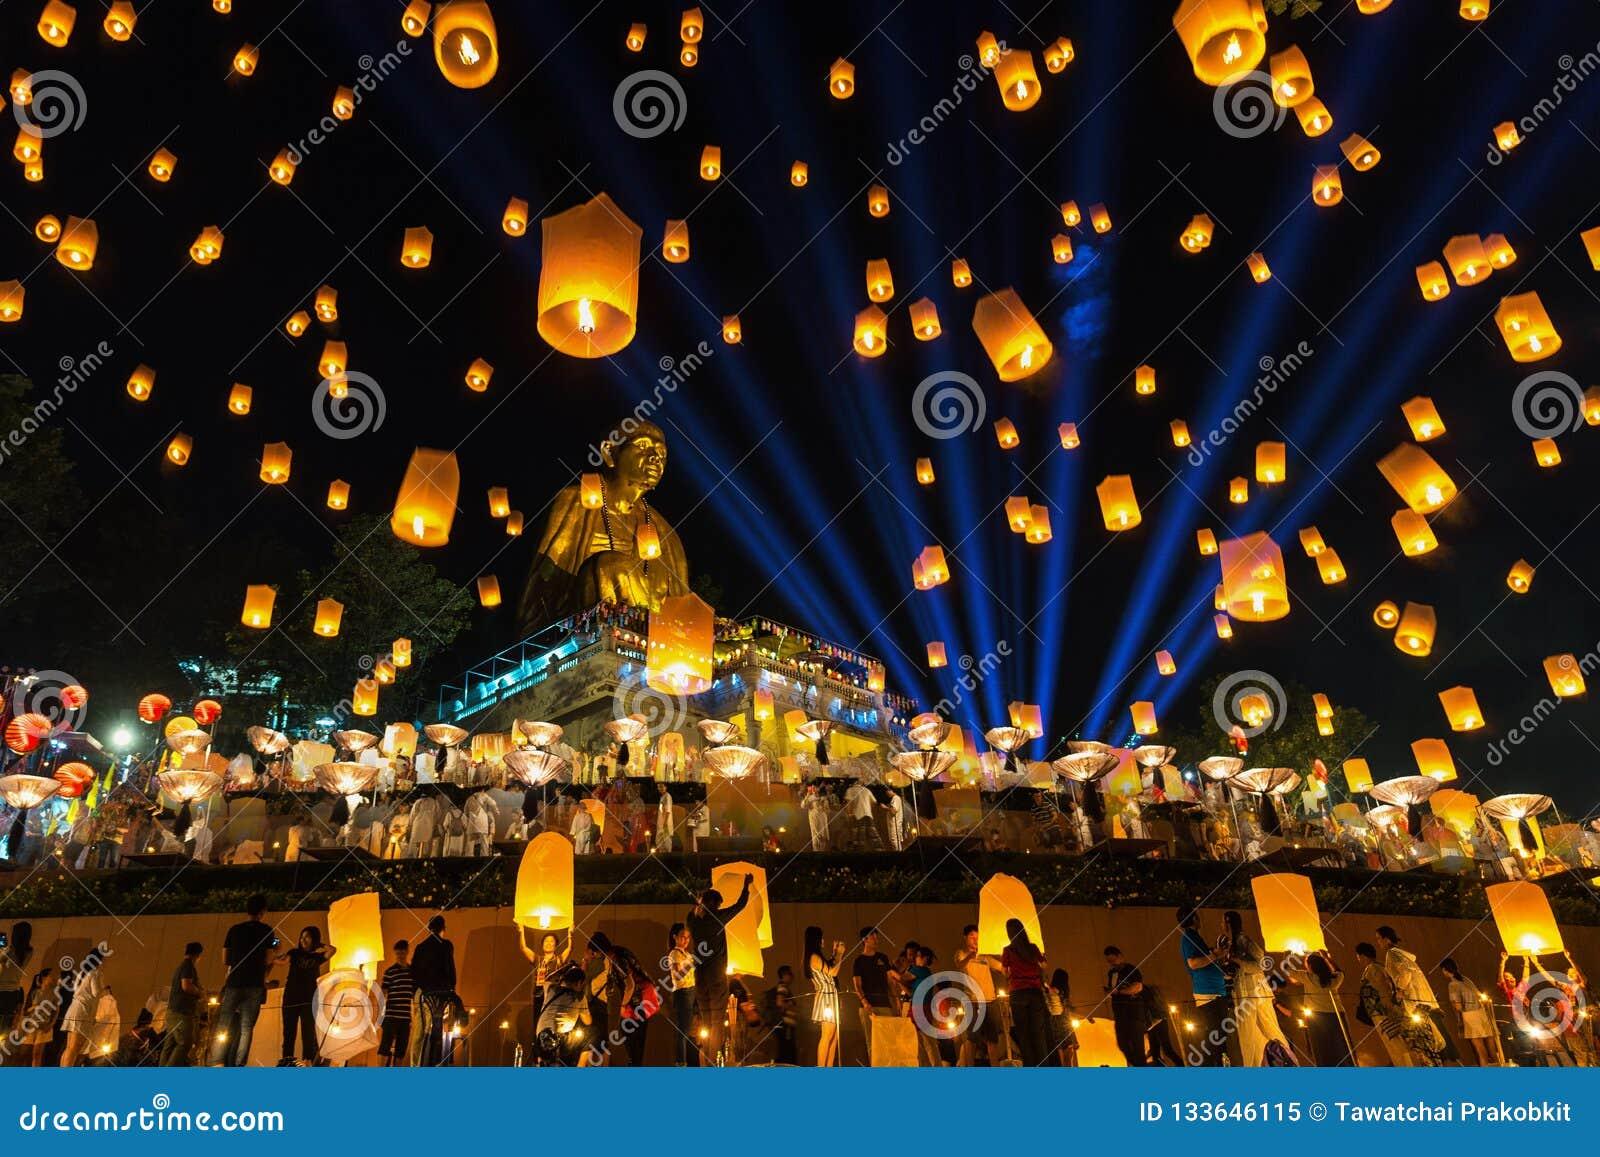 Yee Peng Festival Loy Krathong Celebration And Floating